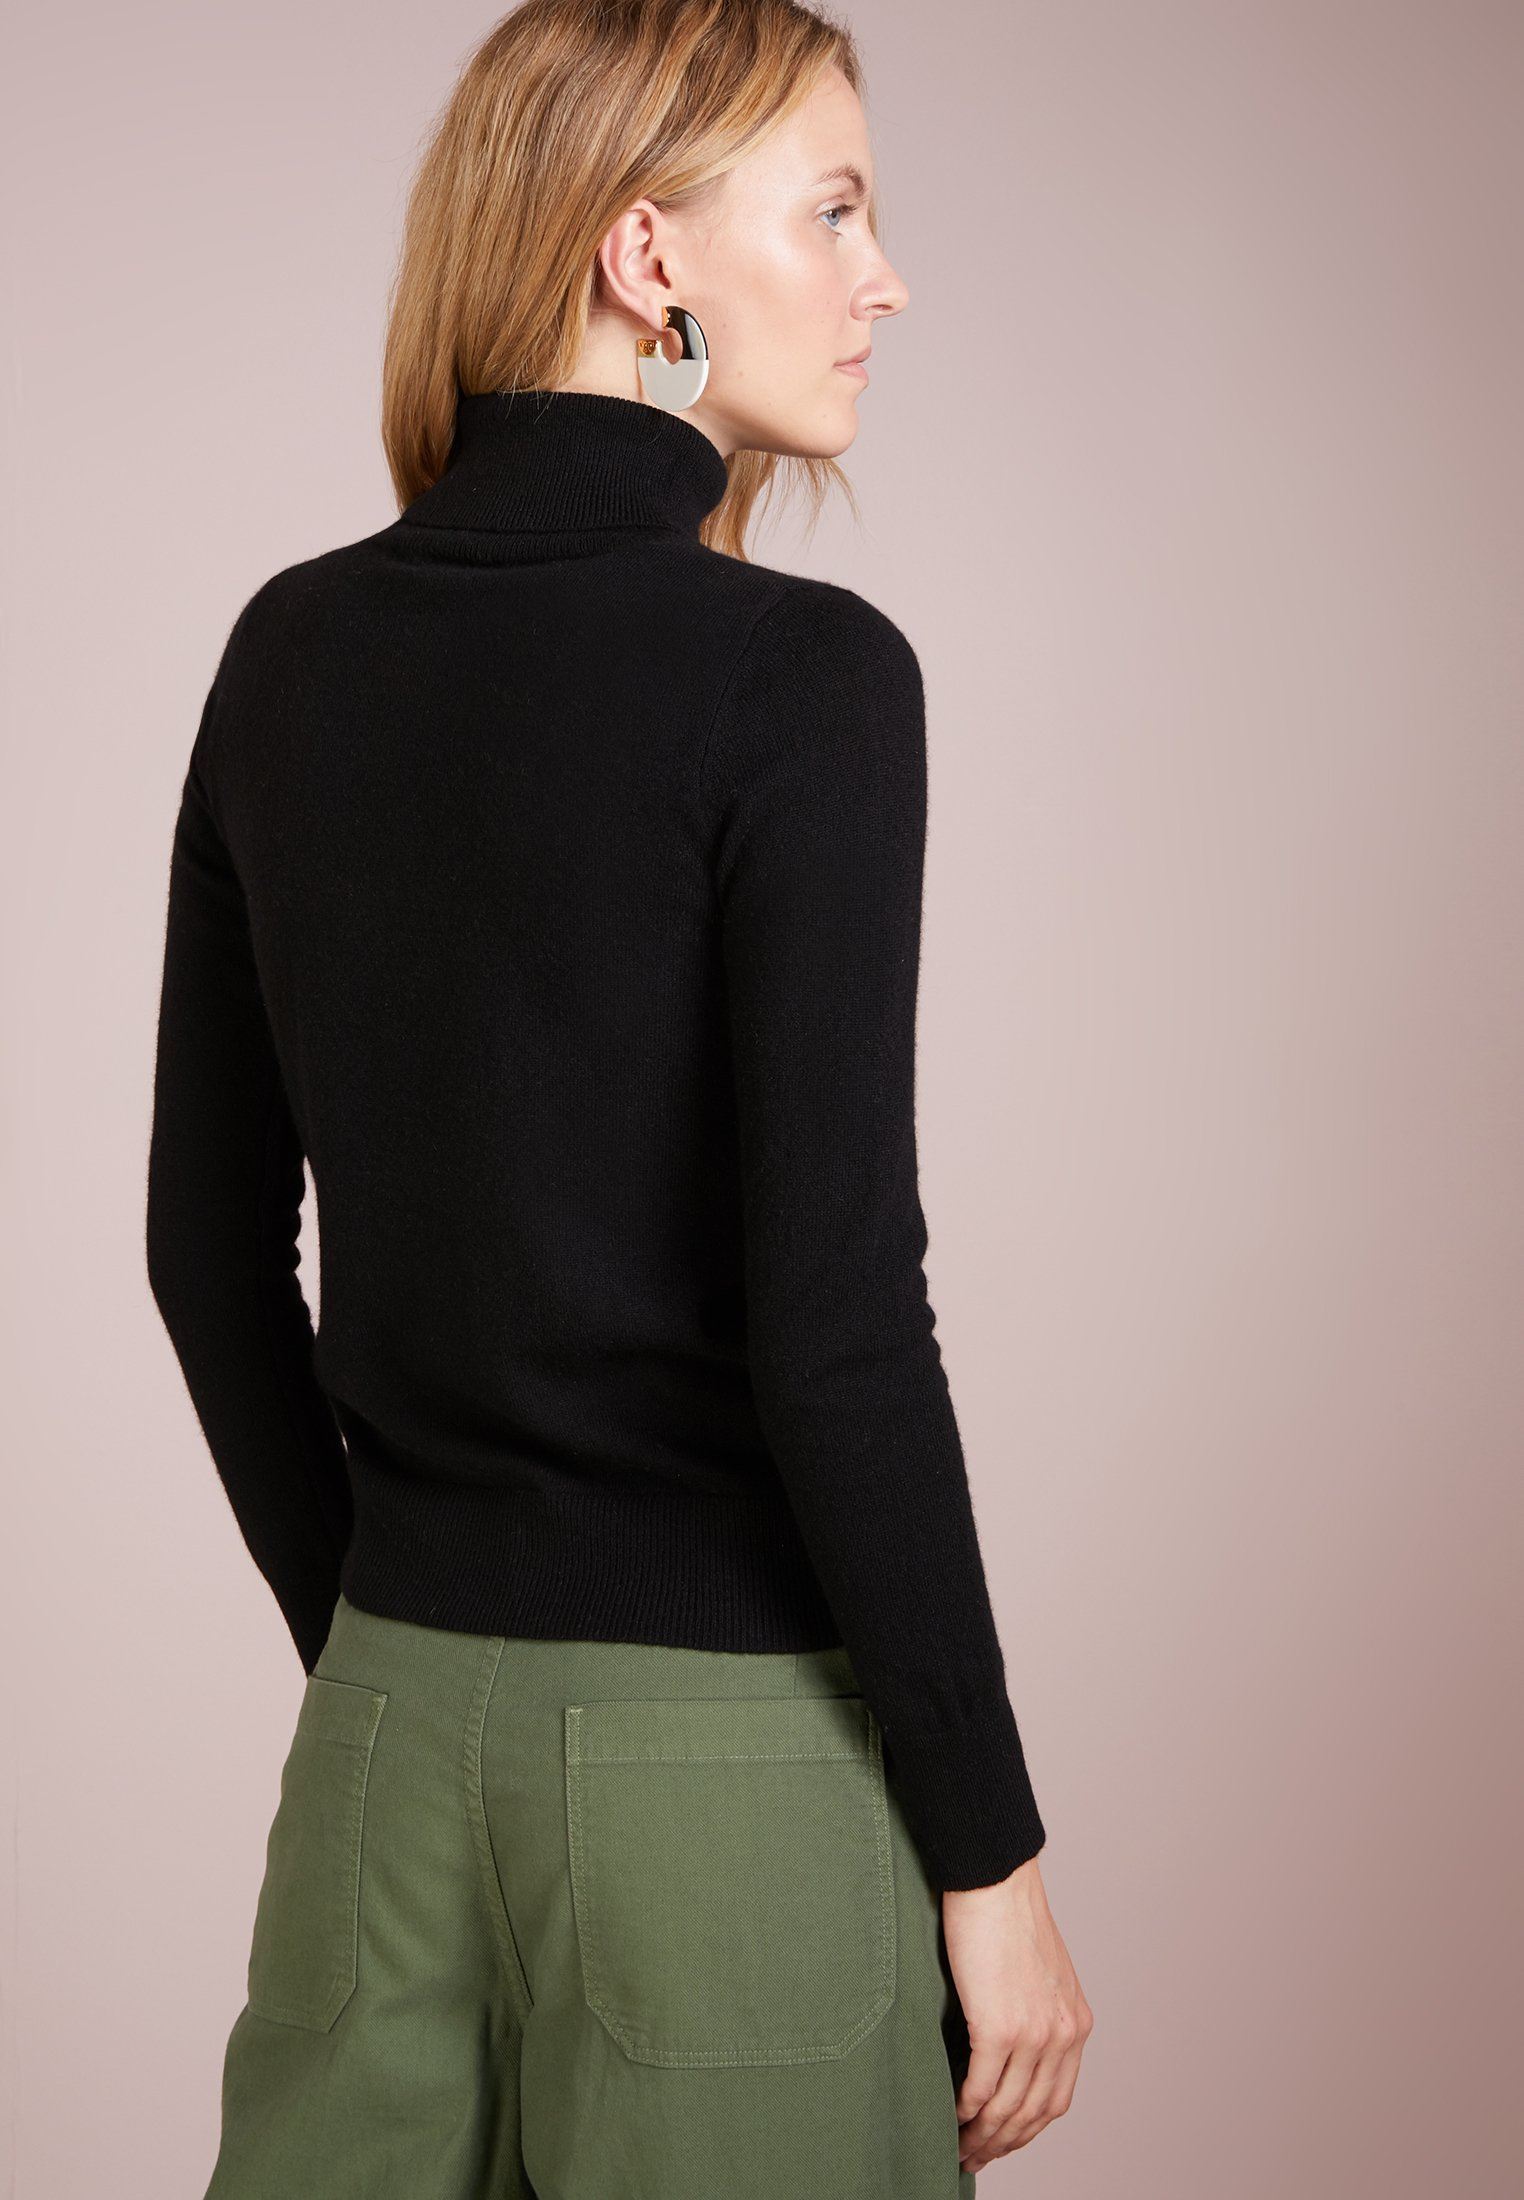 Cashmere Pure Turtleneck SweaterPullover Black Pure Black Cashmere Turtleneck SweaterPullover HED29I